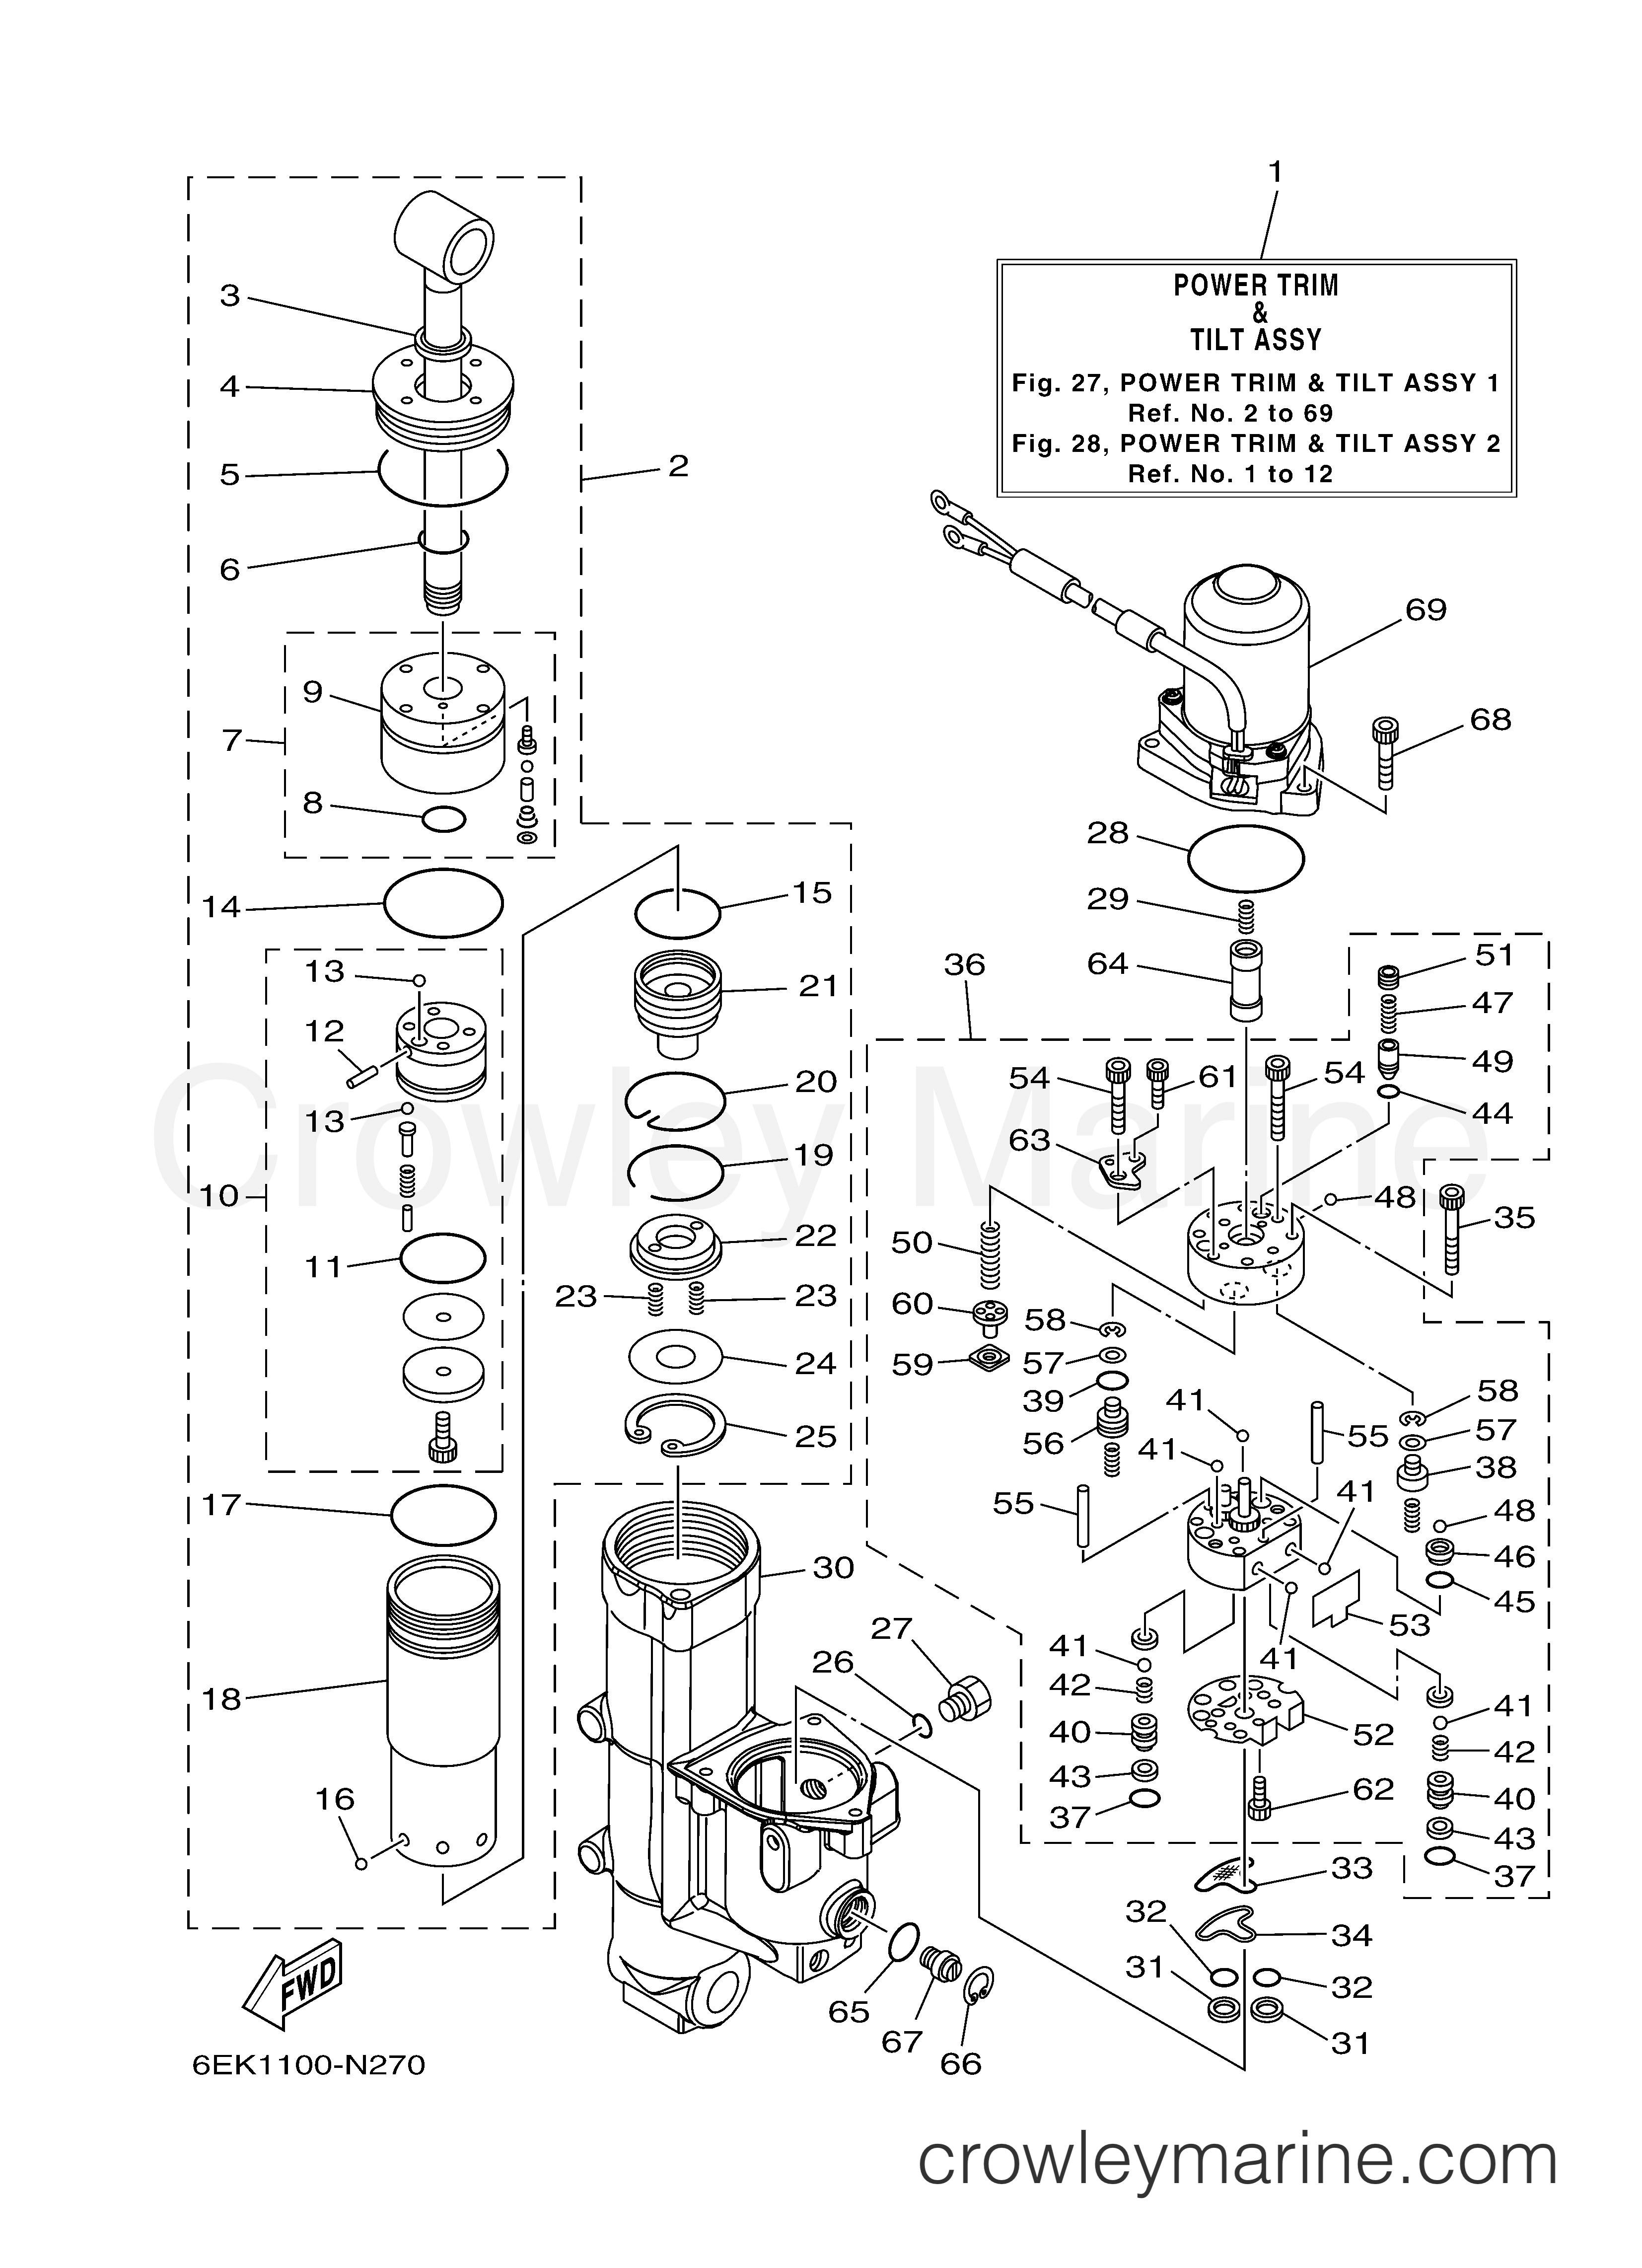 power trim tilt assy 1